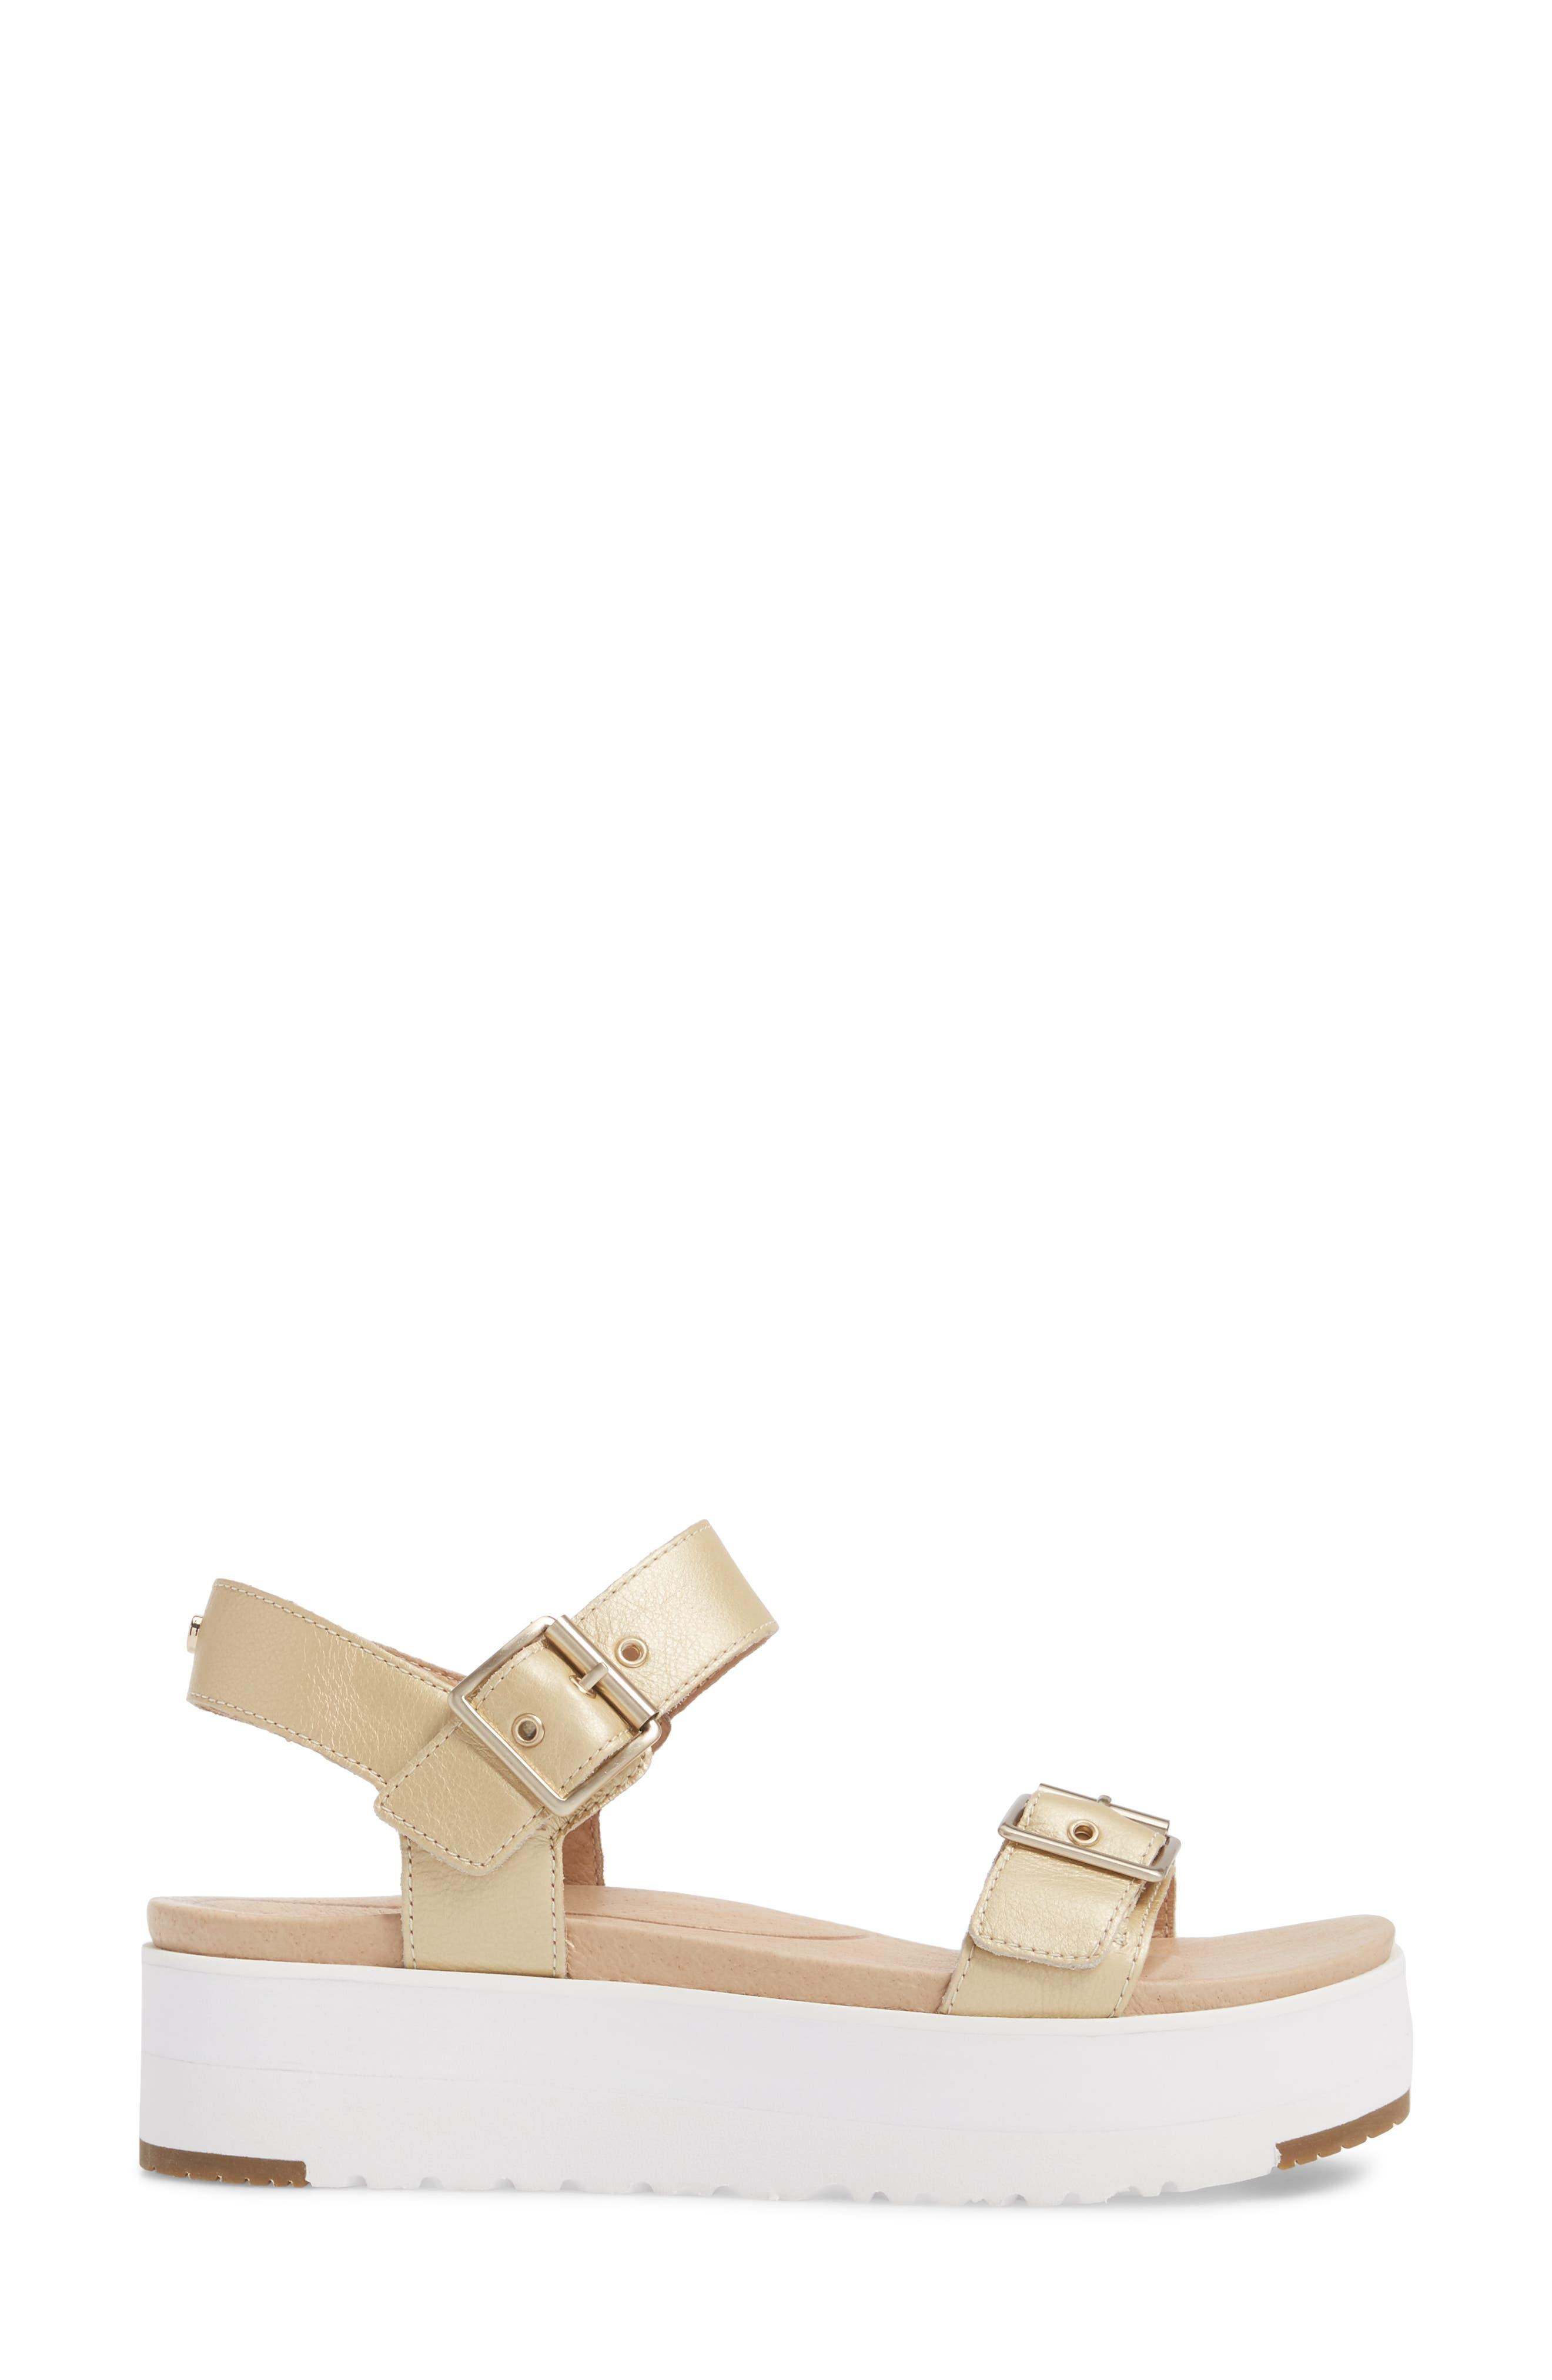 Angie Platform Sandal,                             Alternate thumbnail 12, color,